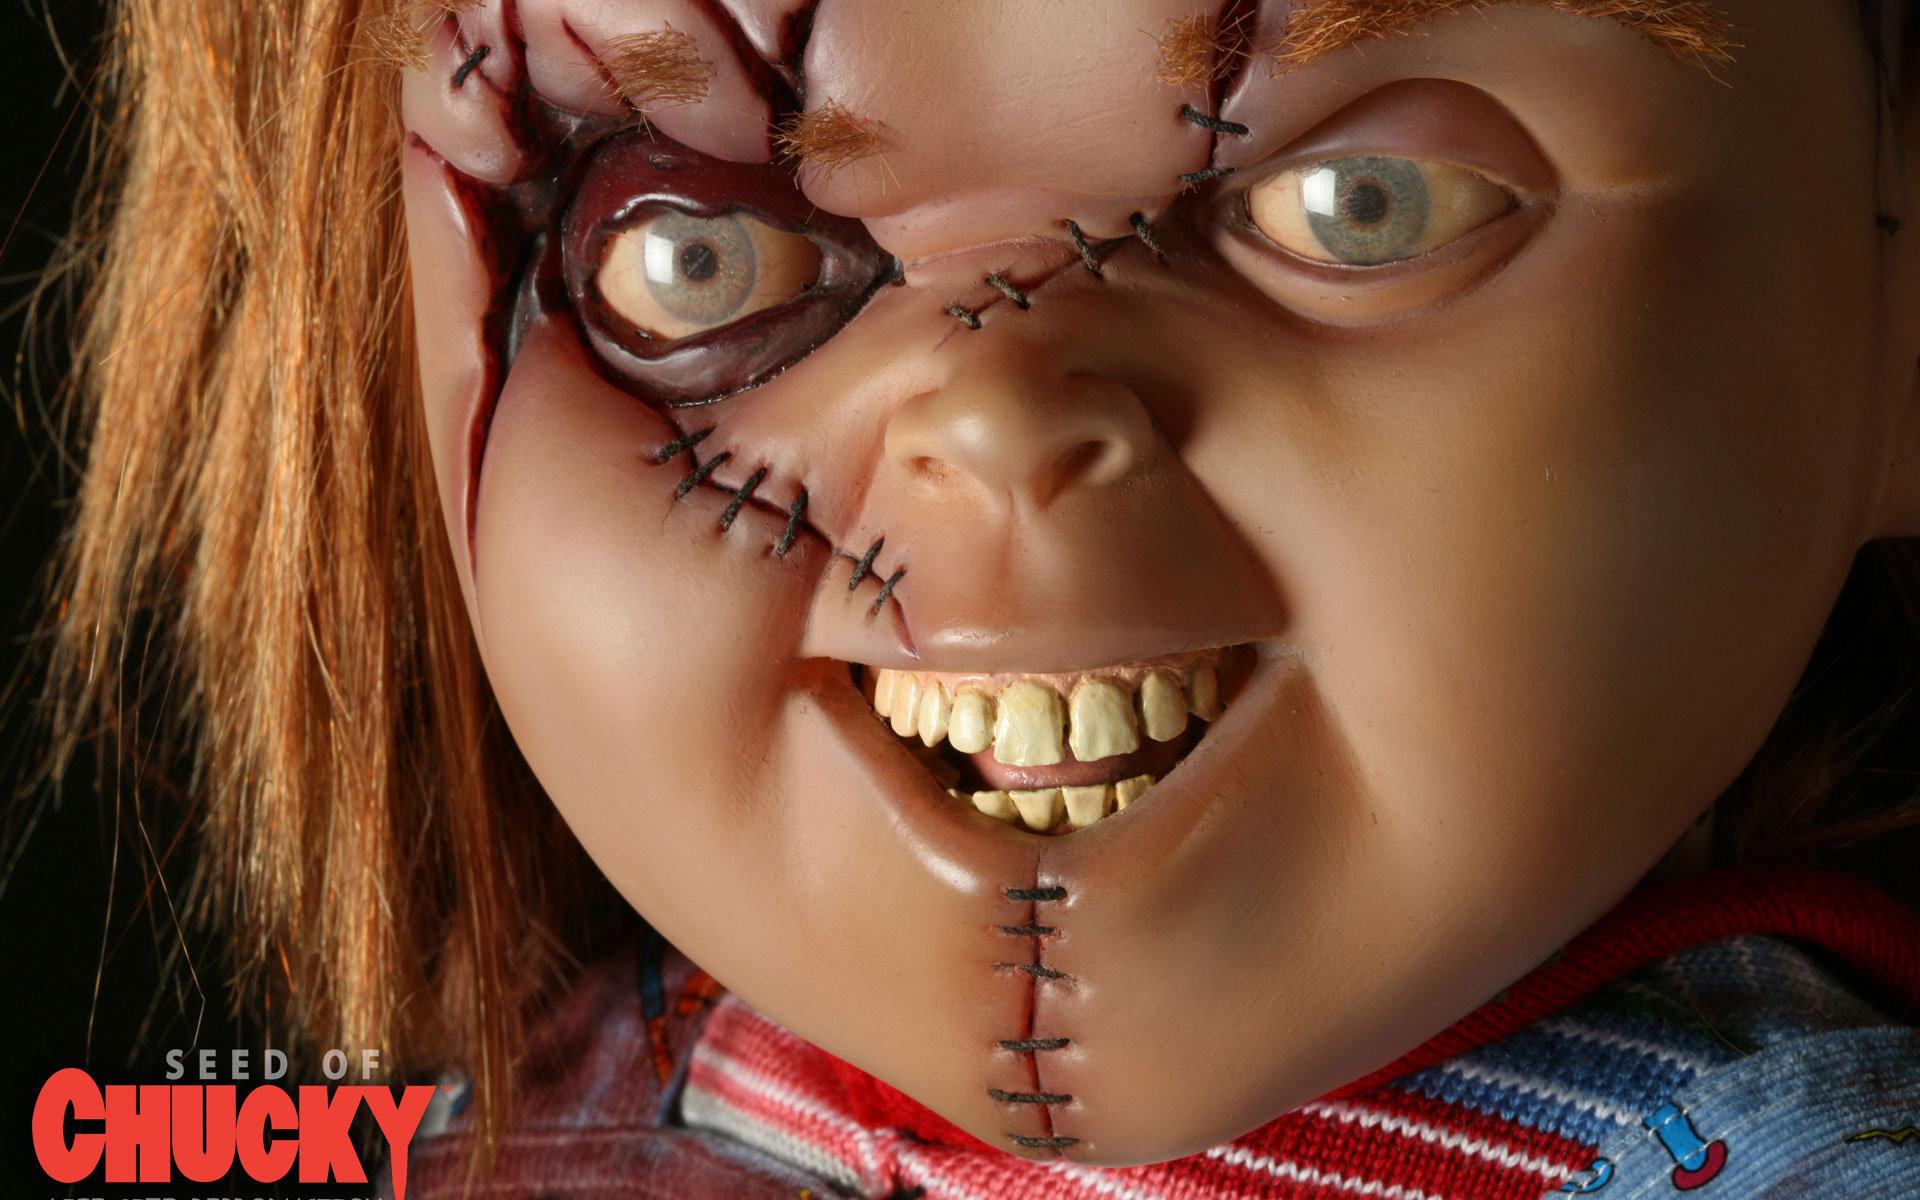 Seed Of Chucky – Seed Of Chucky Wallpaper (29023592) – Fanpop